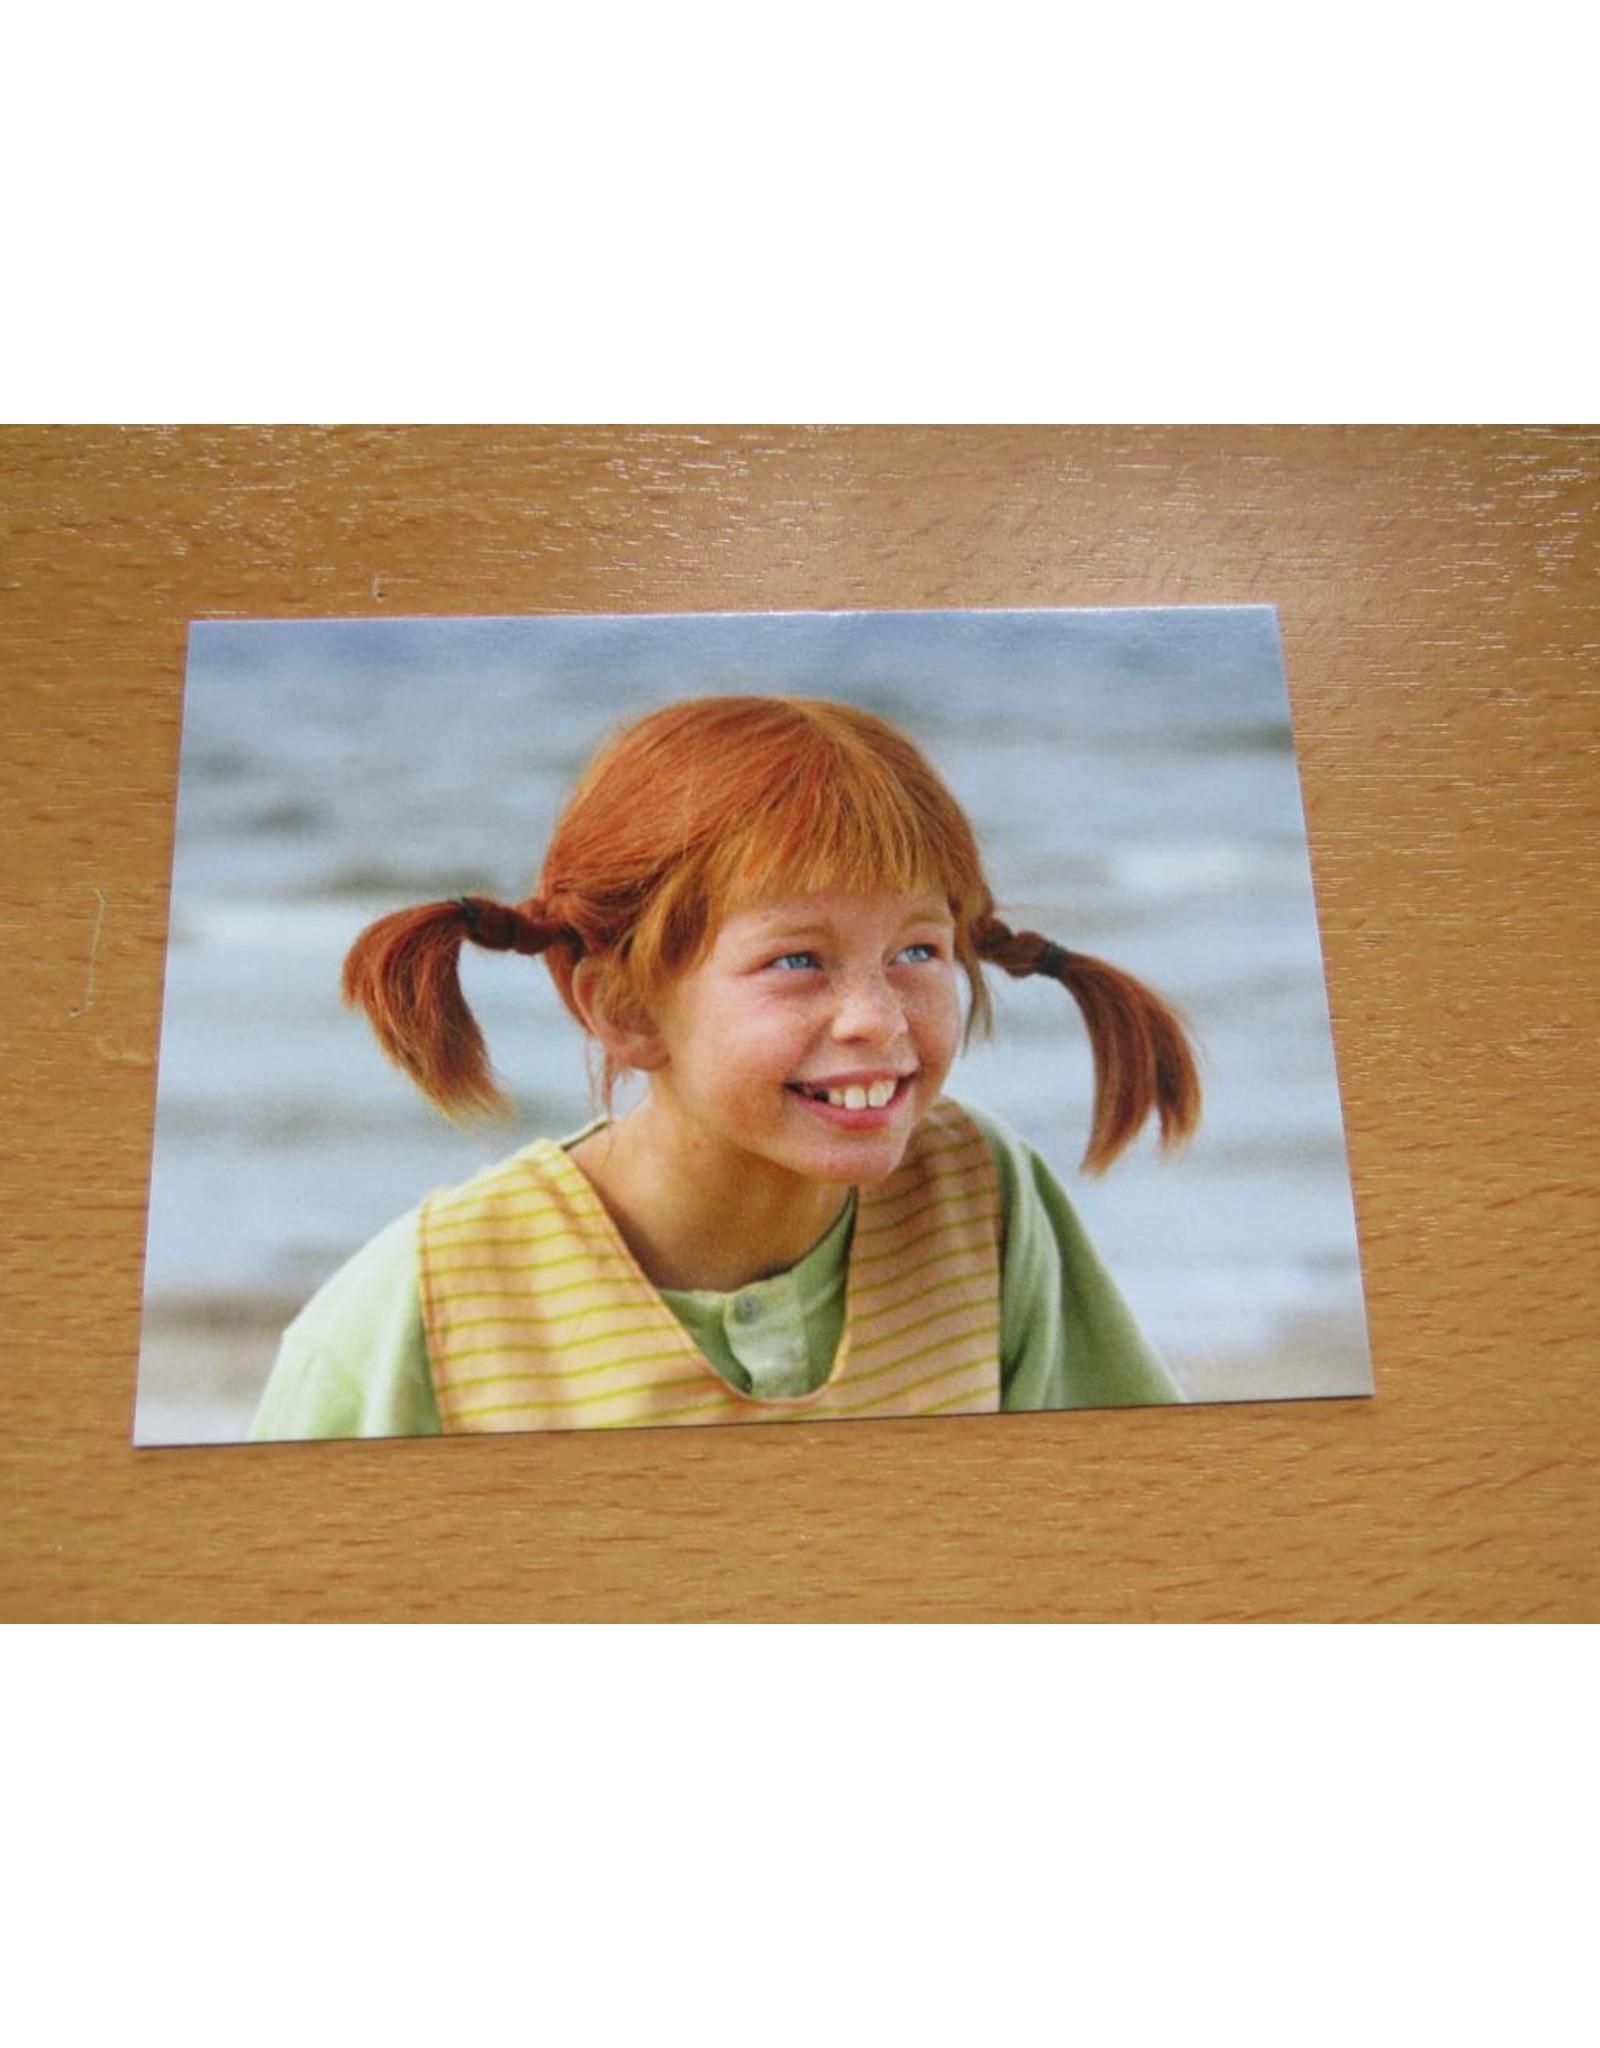 Pippi Langkous Pippi Longstocking card - Laughing